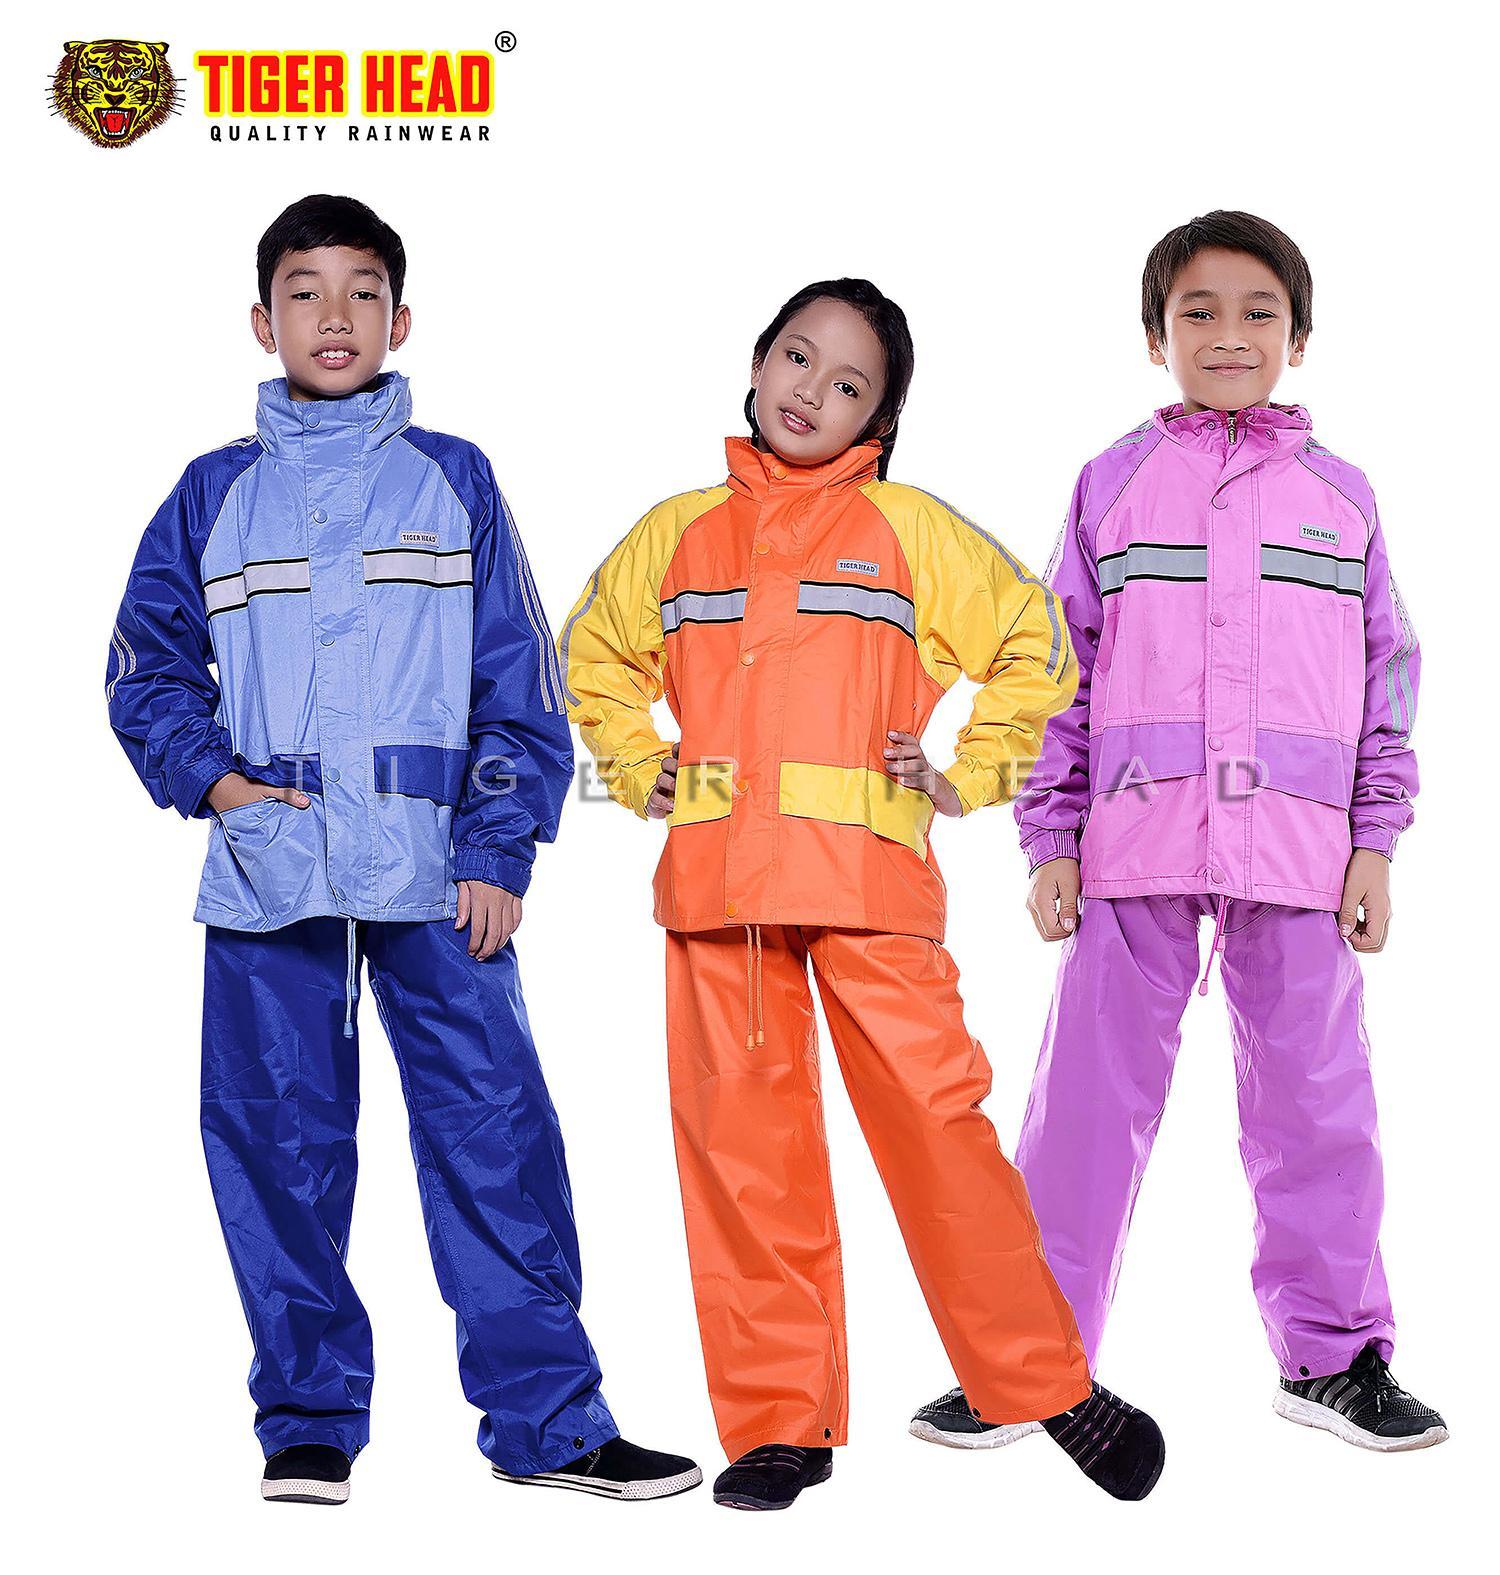 Tiger Head Jas Hujan Stelan Metro Kids 2 Rangkap Seperti Jaket - Bahan Seperti Jas hujan